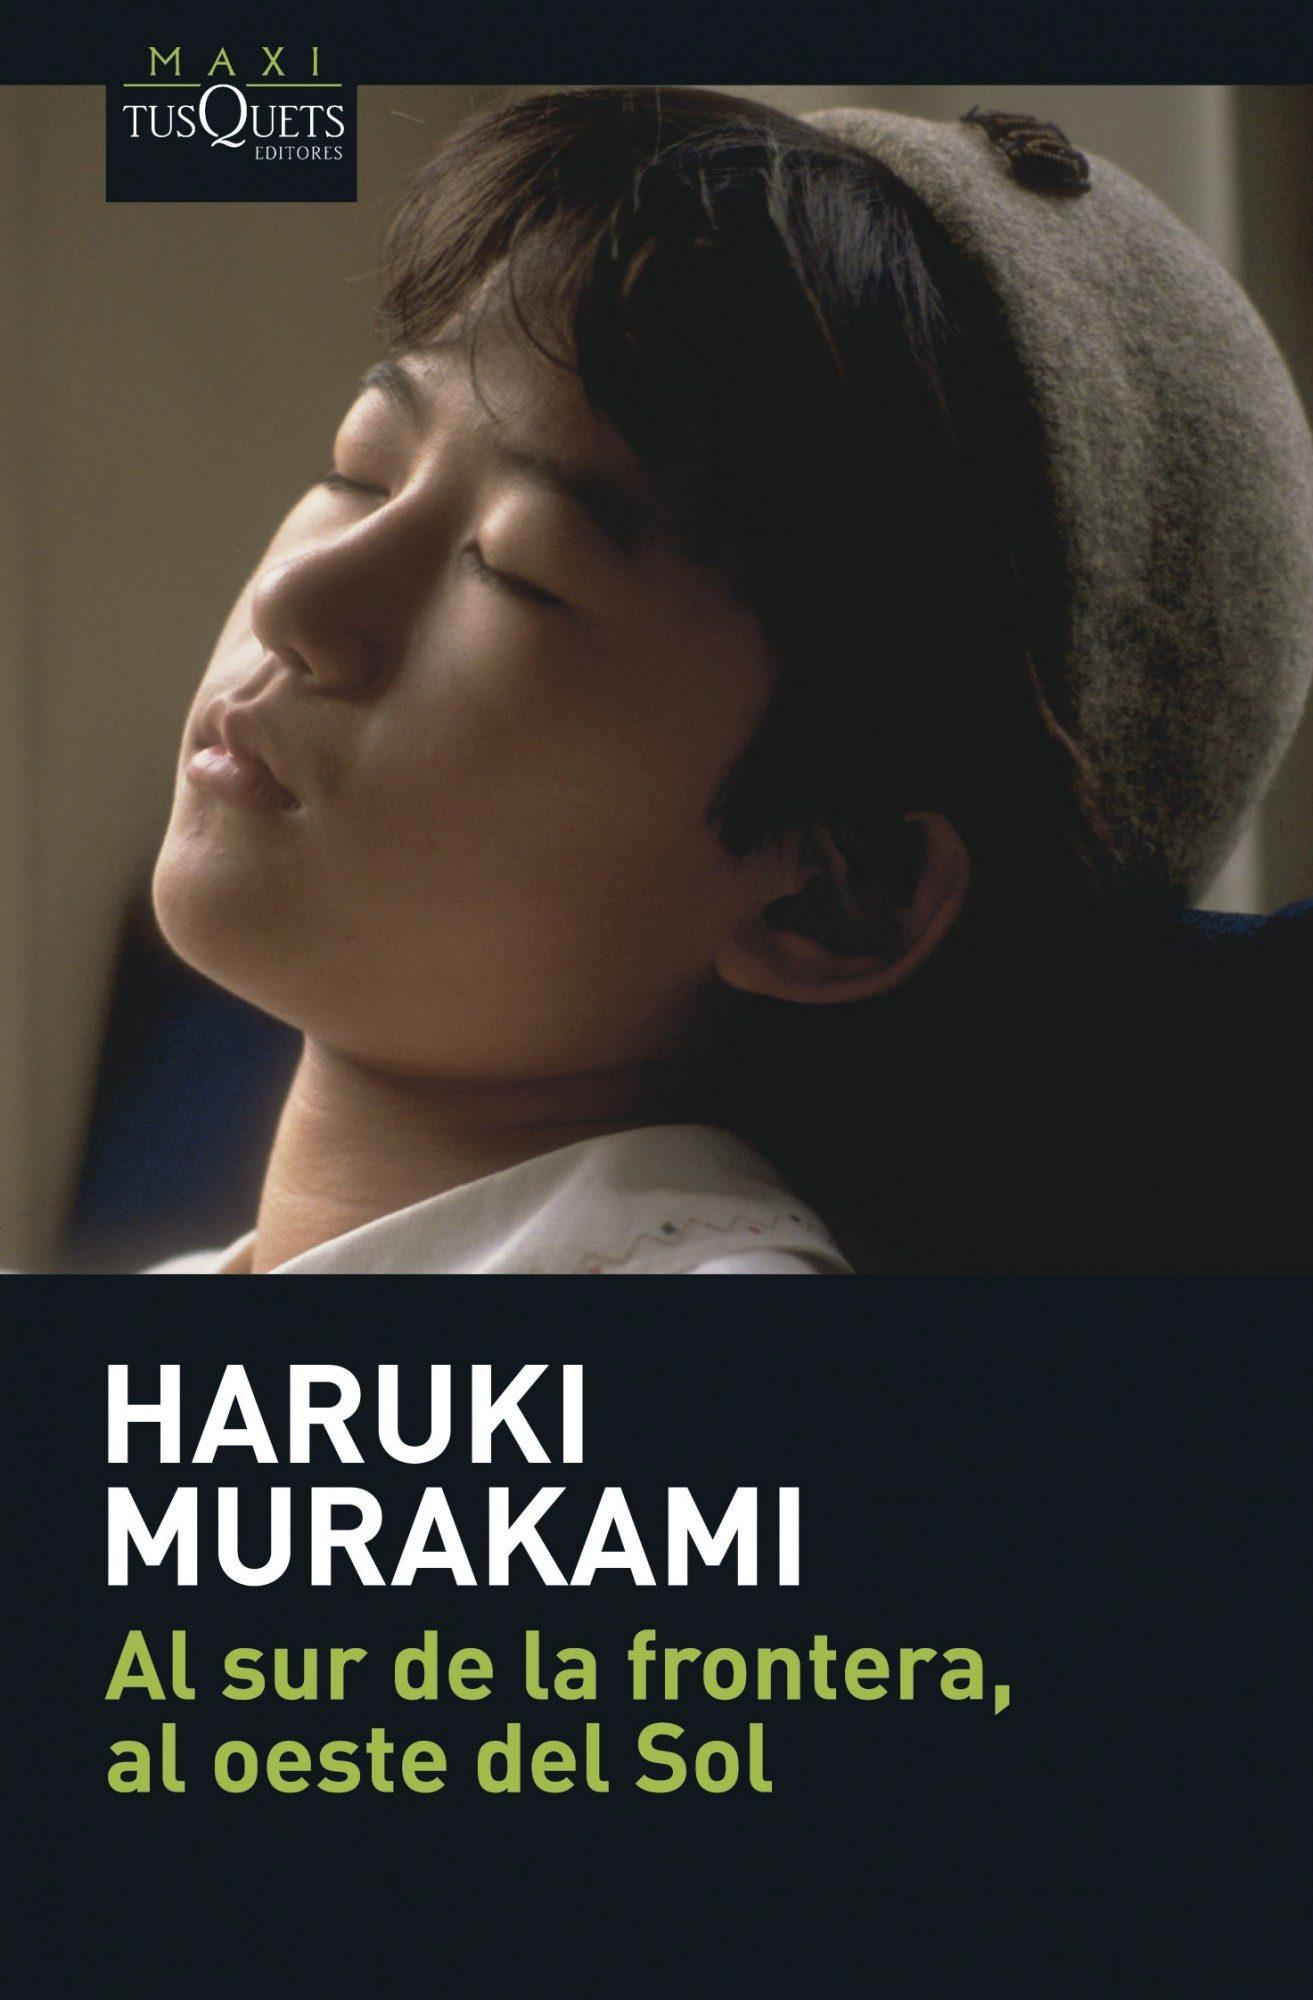 Al sur de la Frontera, al Oeste del sol - Haruki Murakami - Tusquets